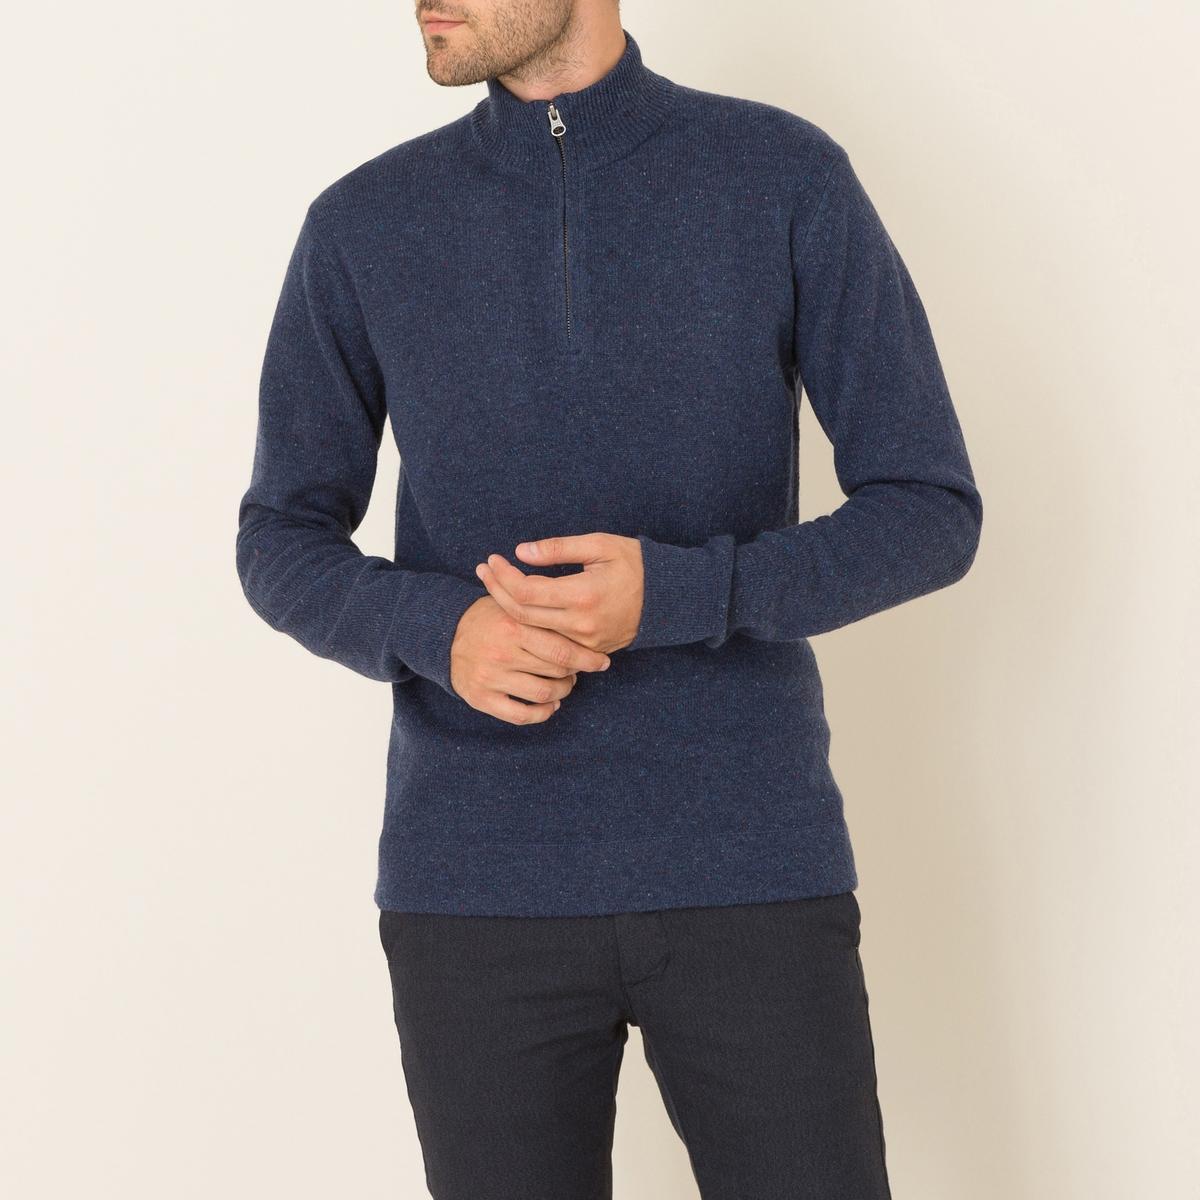 Пуловер с воротником на молнии от La Redoute